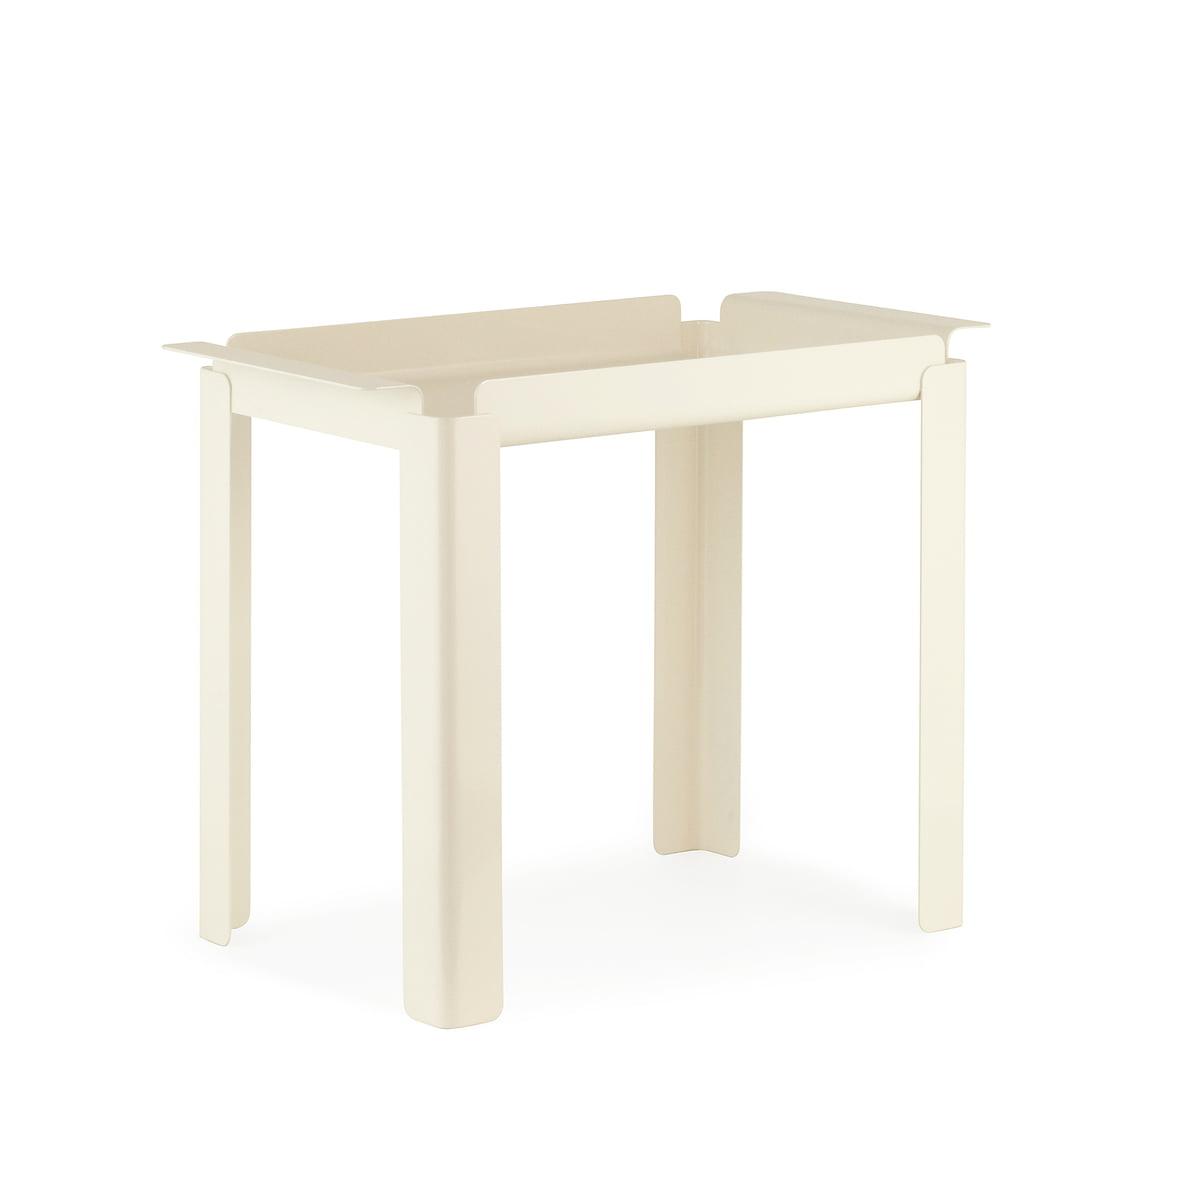 box table 33 x 60 cm von normann copenhagen. Black Bedroom Furniture Sets. Home Design Ideas